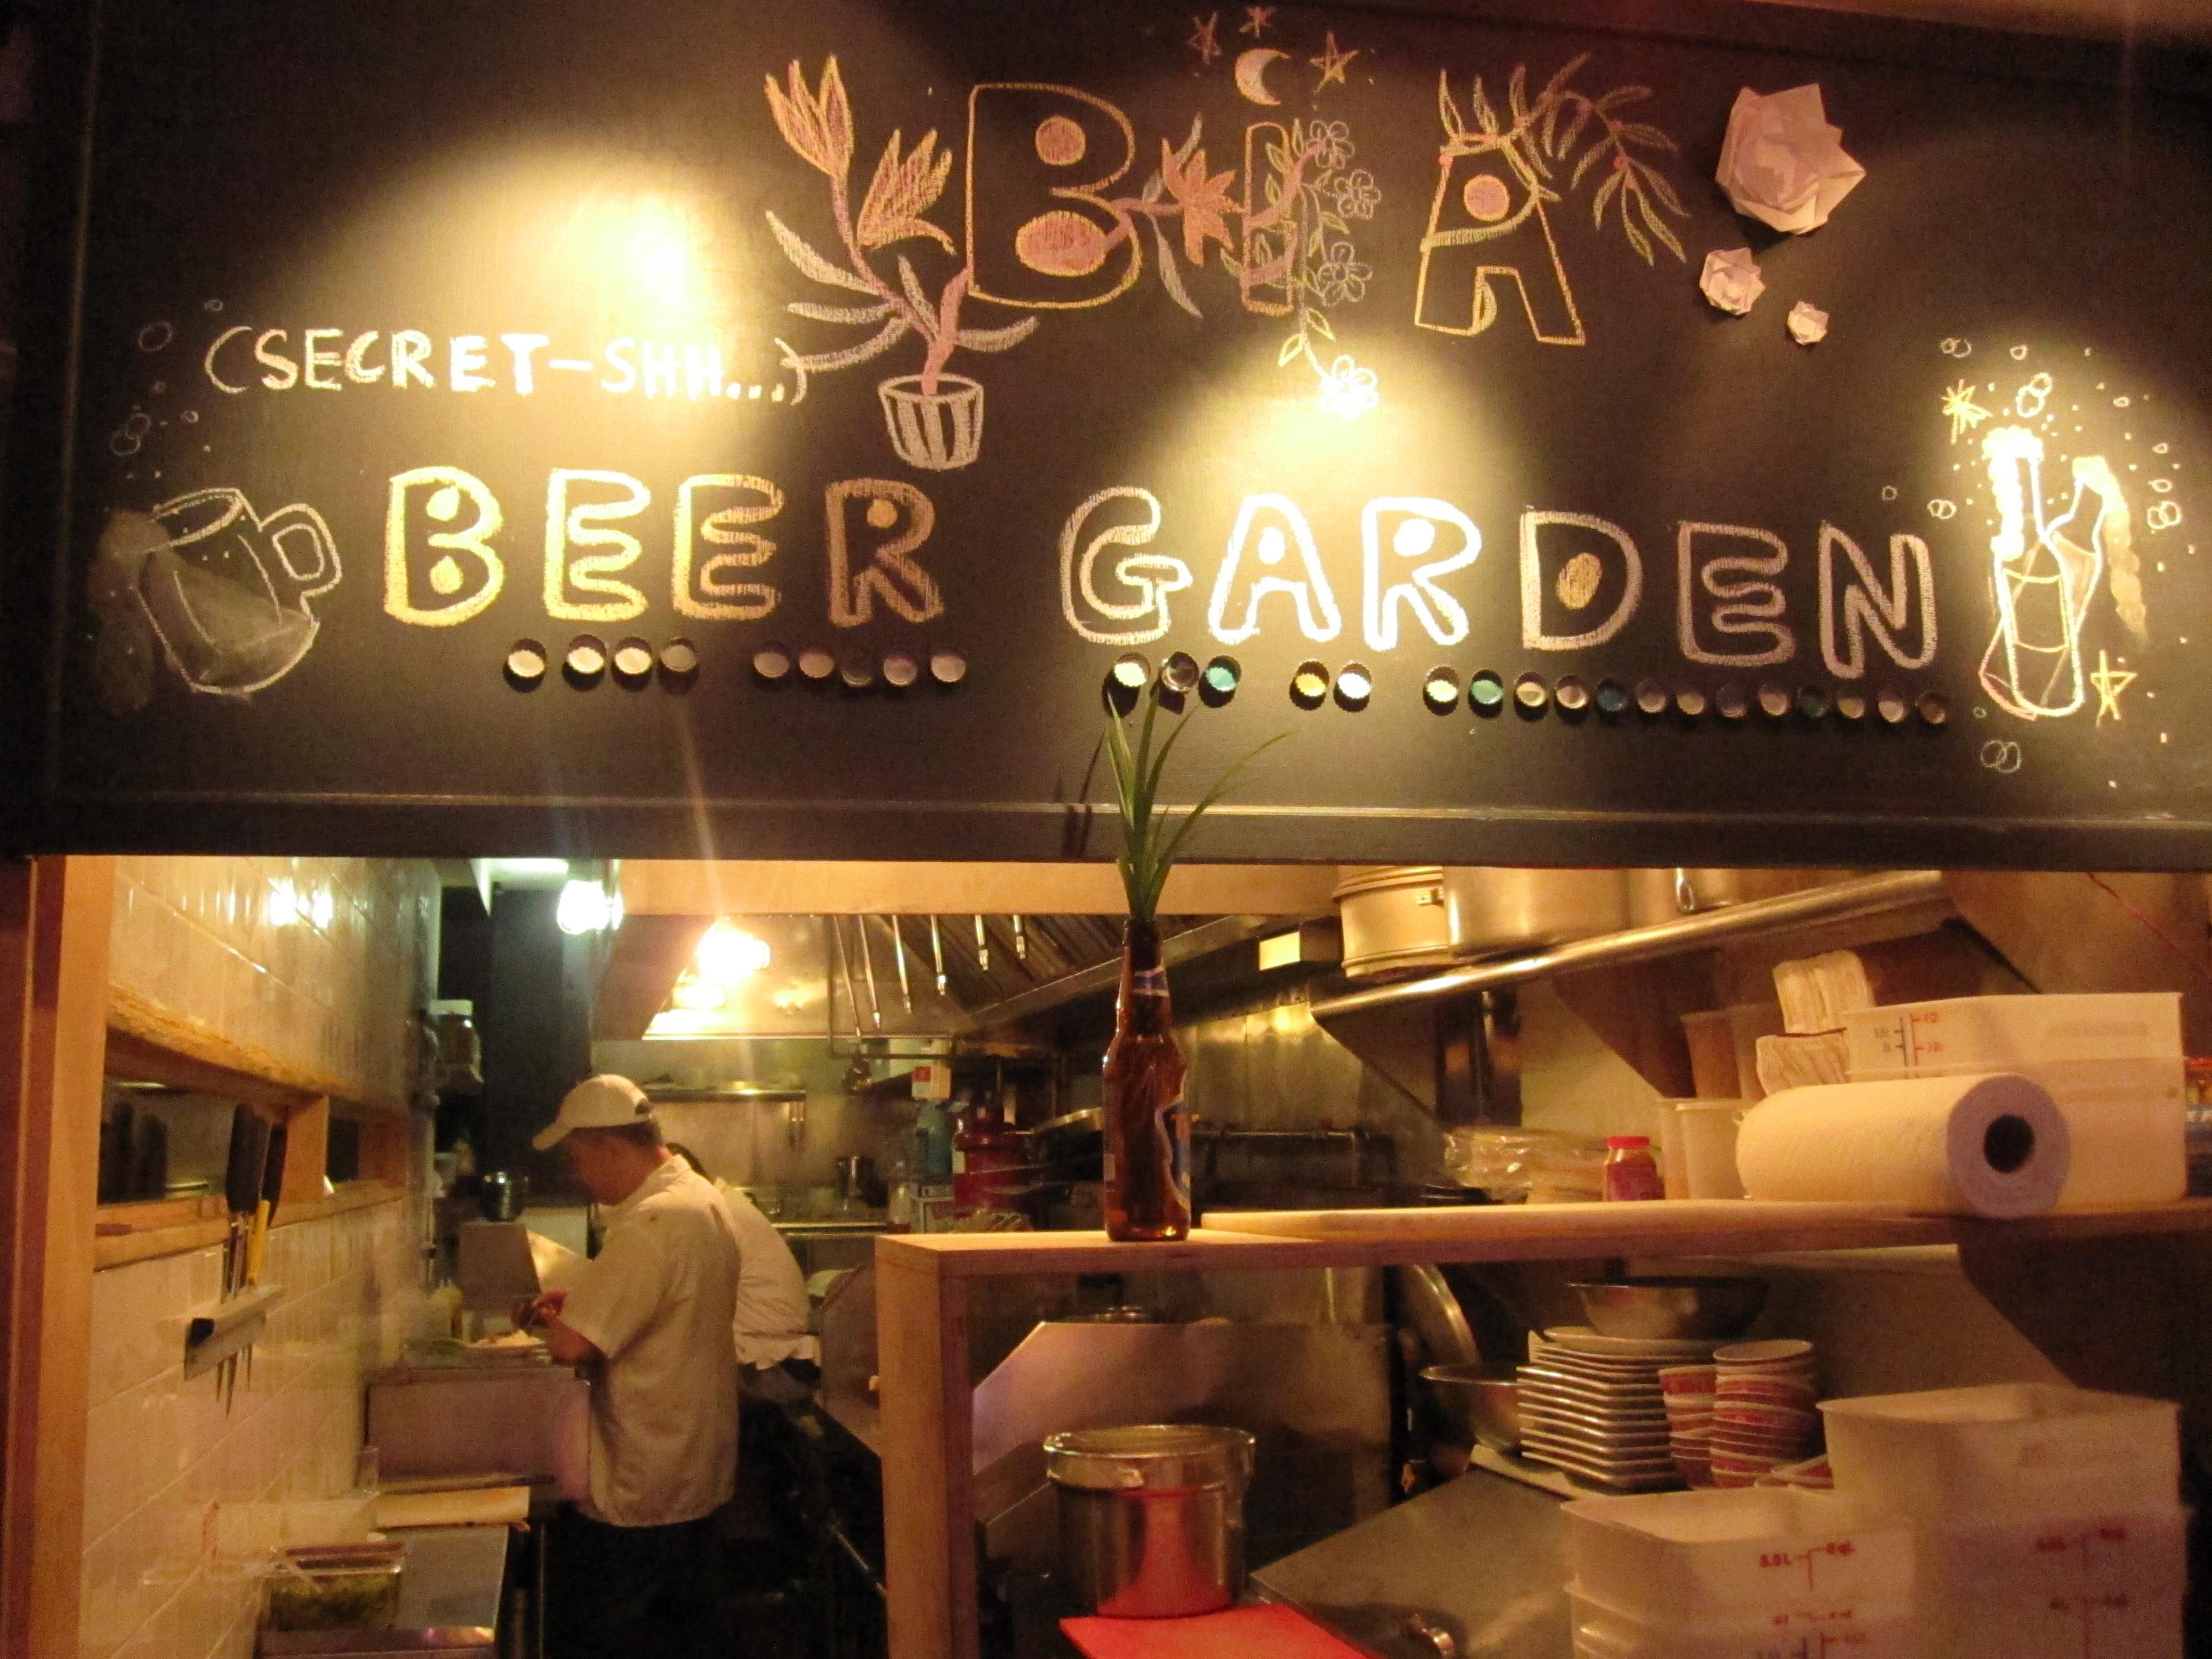 beer garden | itinerant foos on college bar design, silent auction design, long bar design, soda fountain design, beer grotto, jazz lounge design, temporary structure design, cocktail bar design,